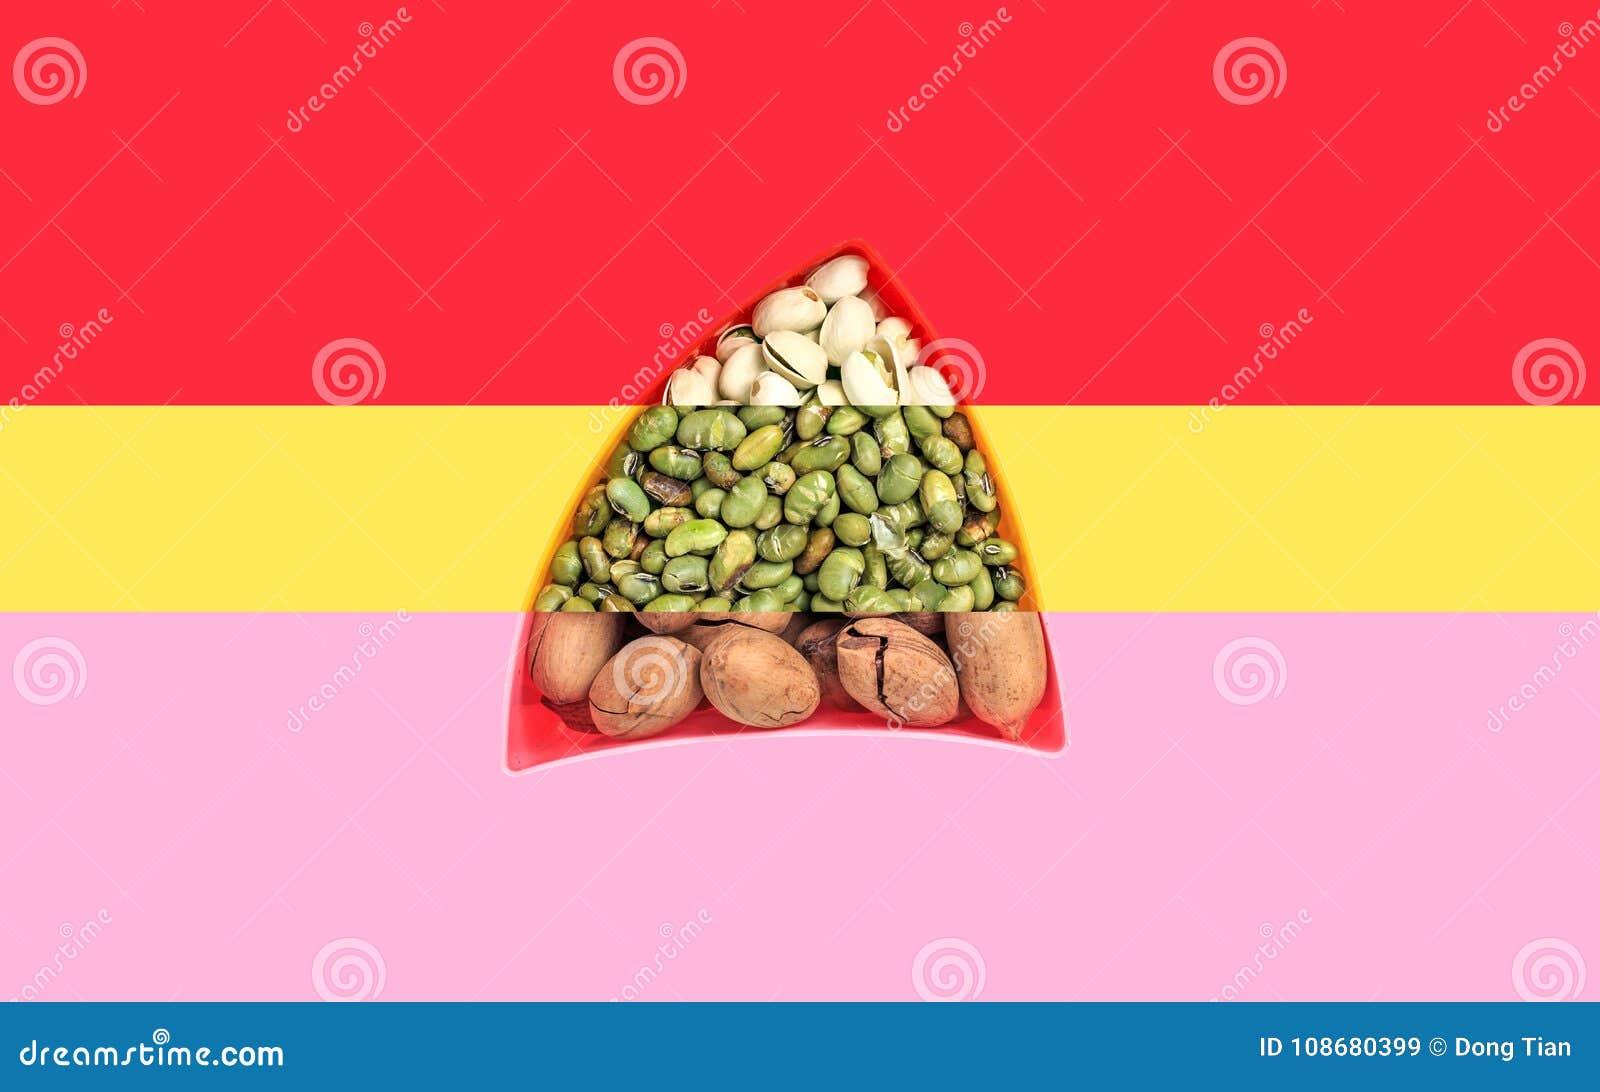 Creative Shooting Dried Fruit Stock Image - Image of housing, aroma ...